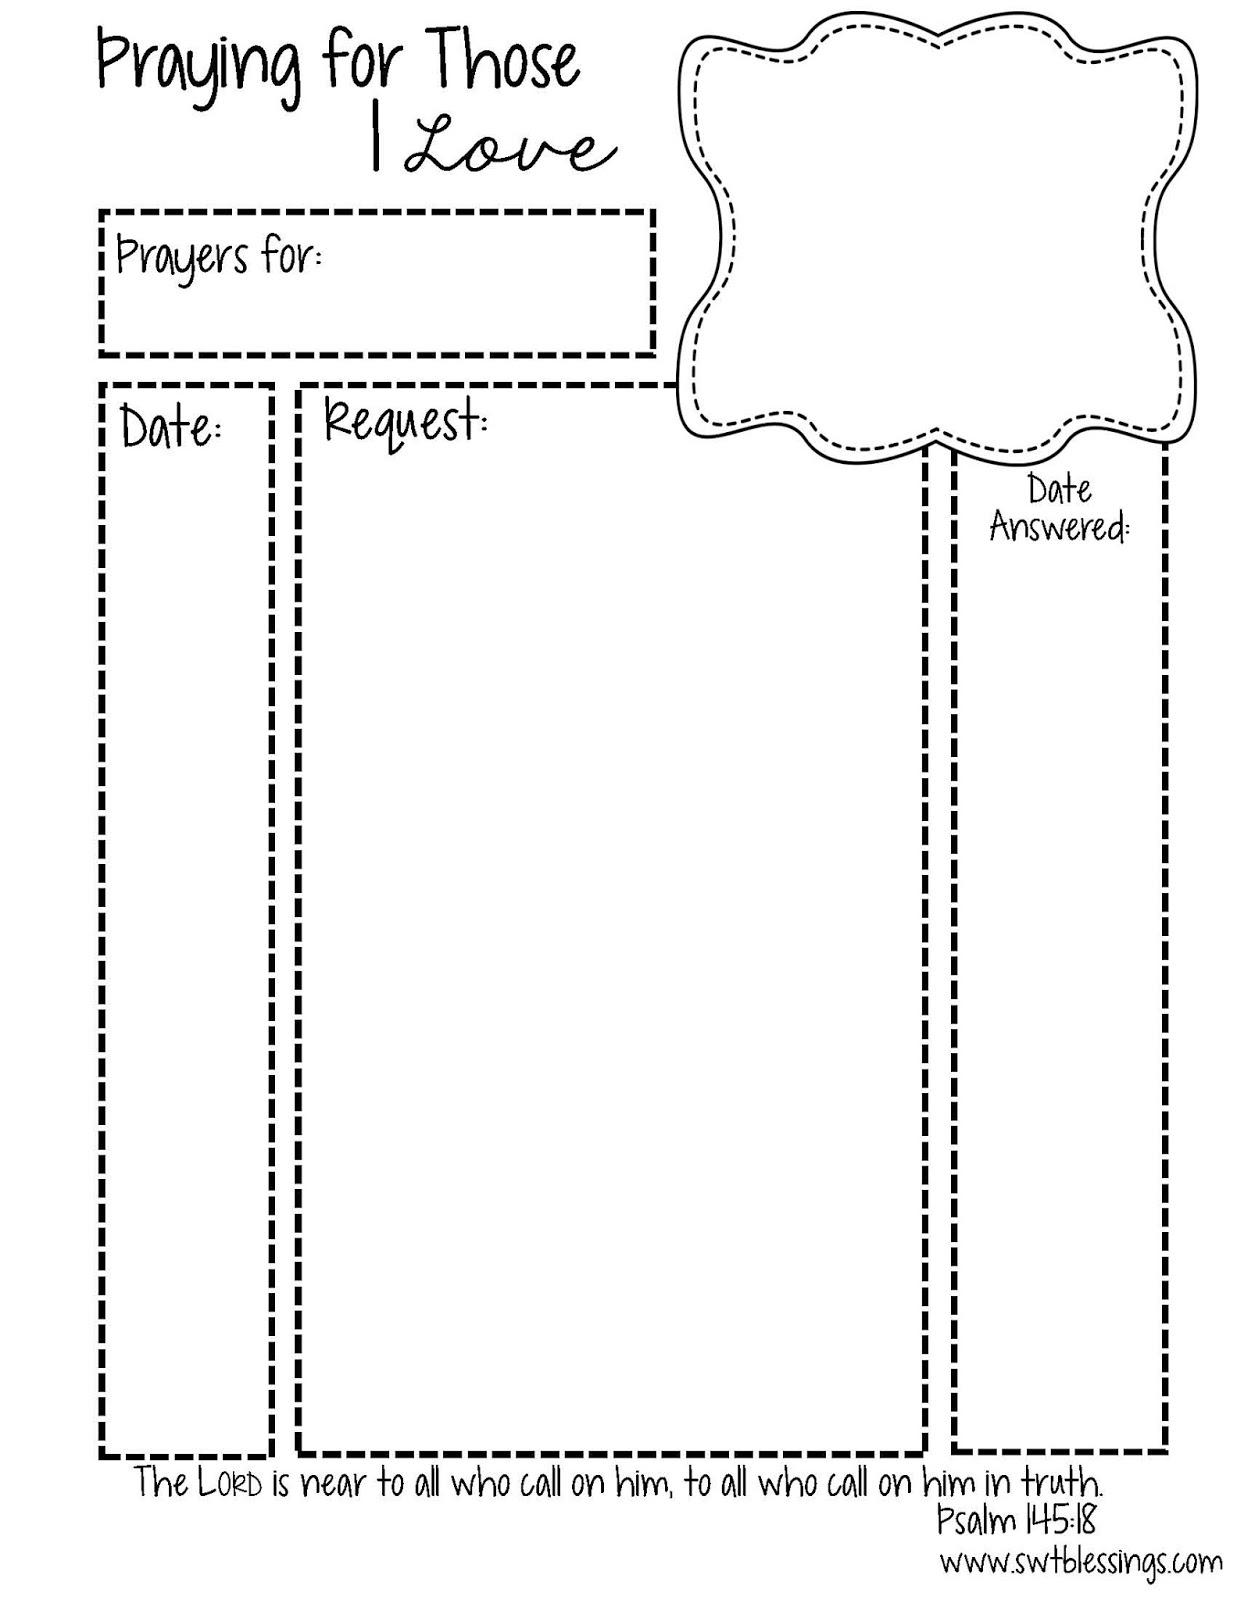 Sweet Blessings: Prayer Request Printables - Free Printable Prayer List